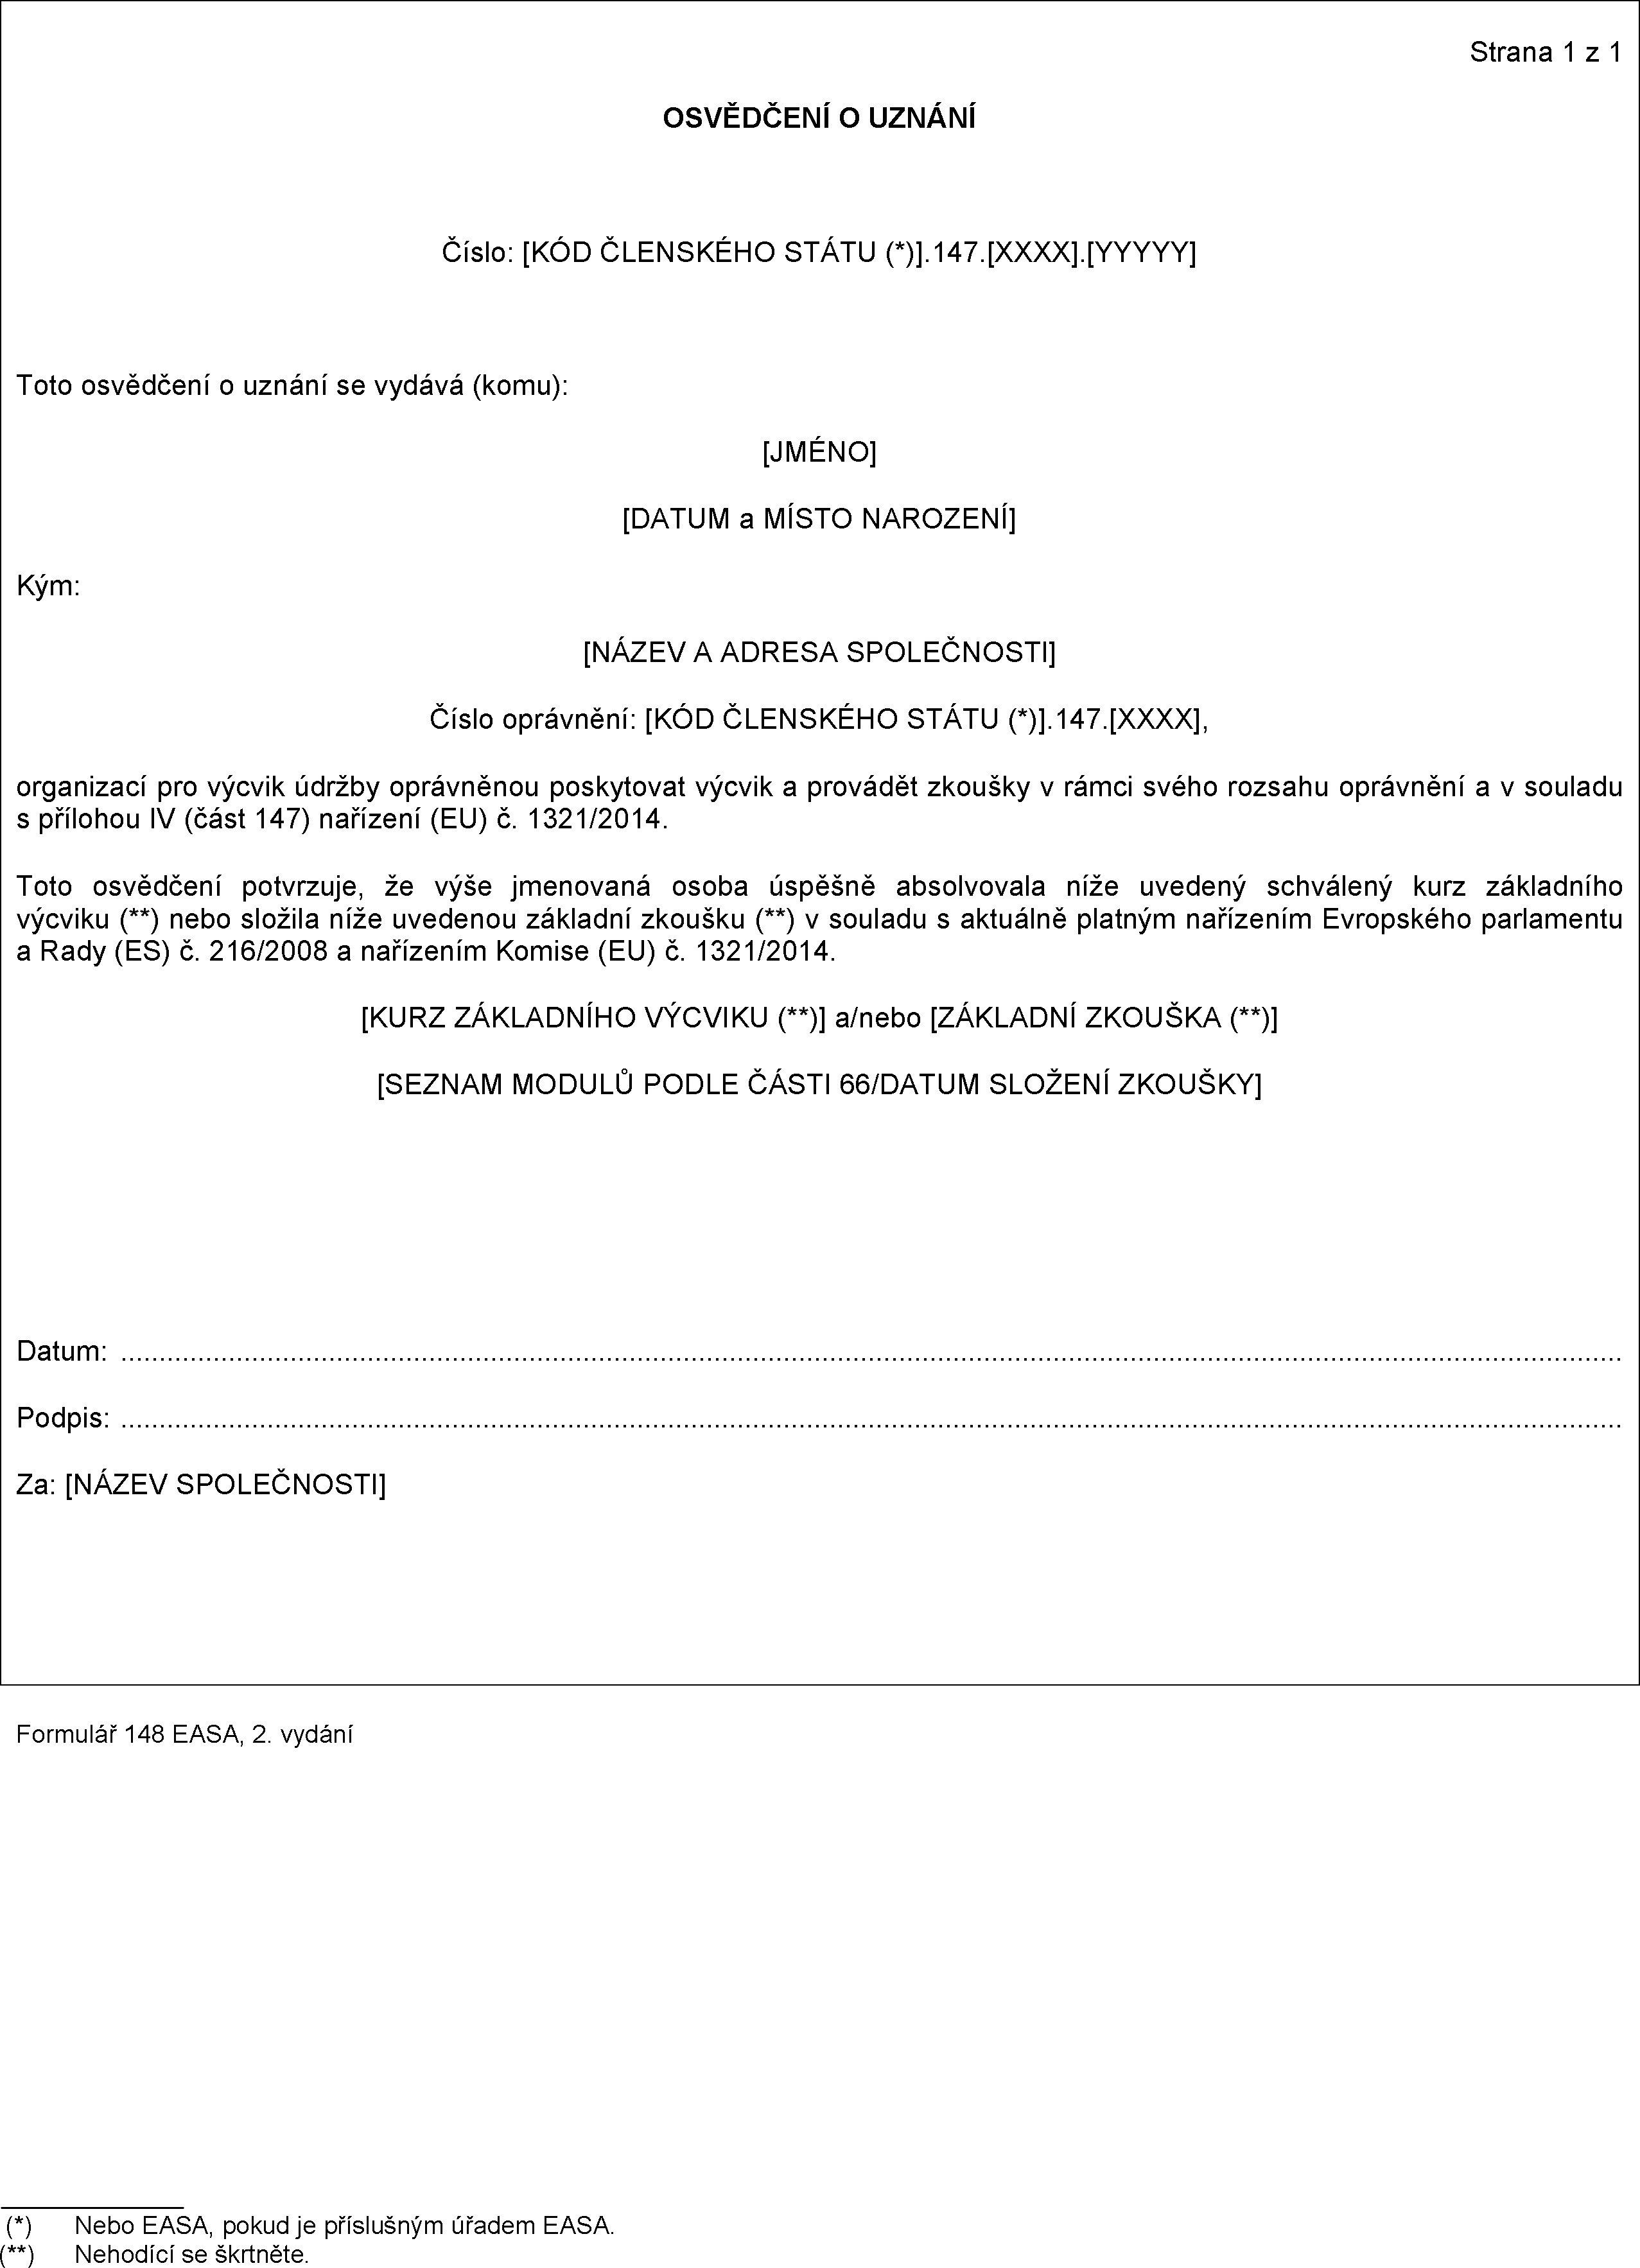 EUR-Lex - 02014R1321-20160825 - EN - EUR-Lex